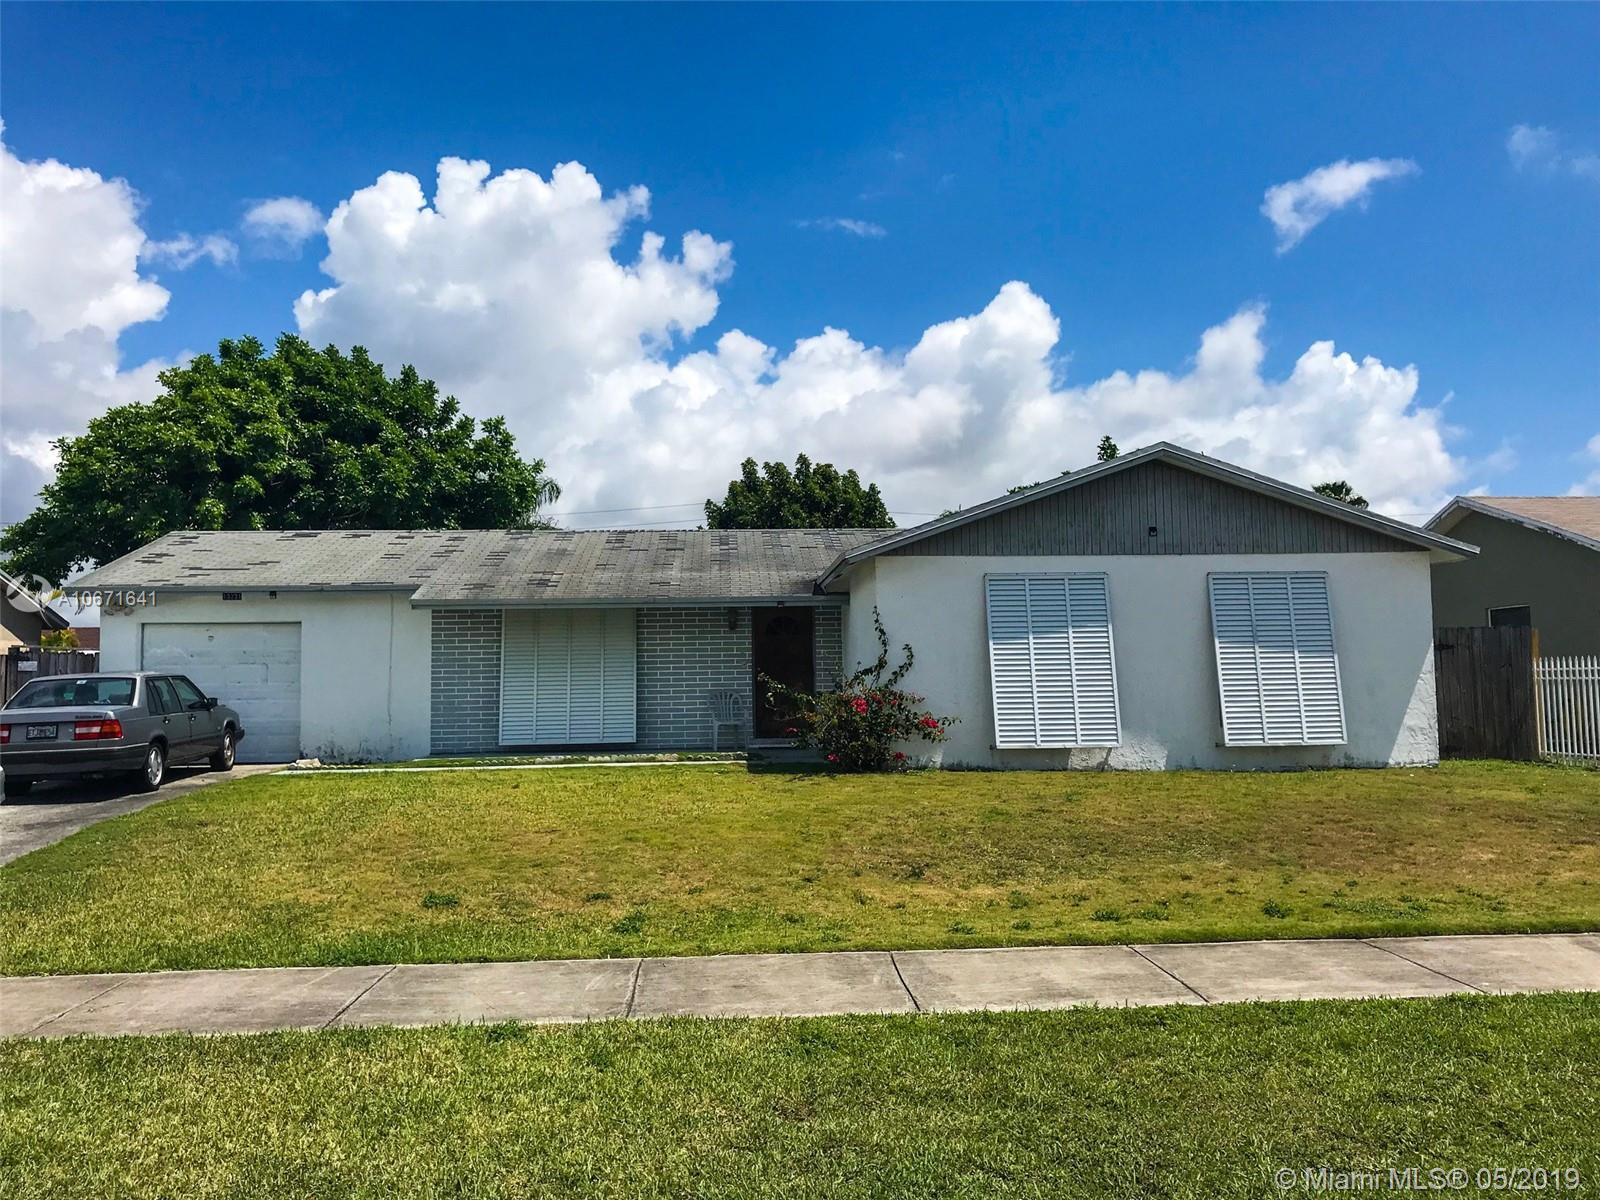 13231 SW 256th Ter, Homestead, FL 33032 - Homestead, FL real estate listing